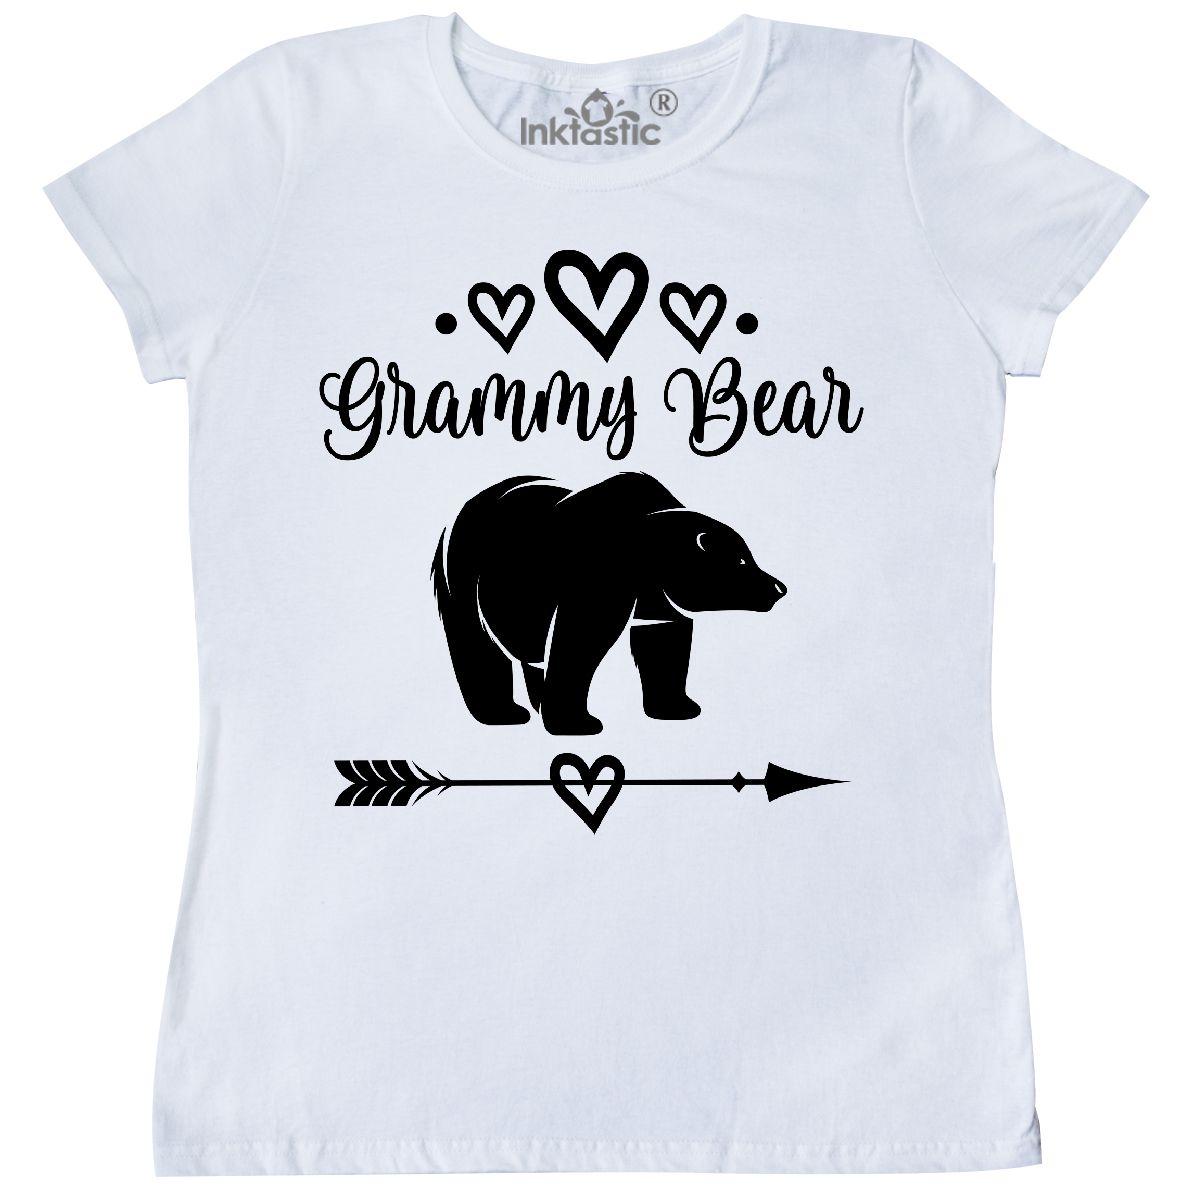 Inktastic Grammy Bear Grandma Gift Women s T-Shirt Present Tribal ... 8d6ad0ef7f